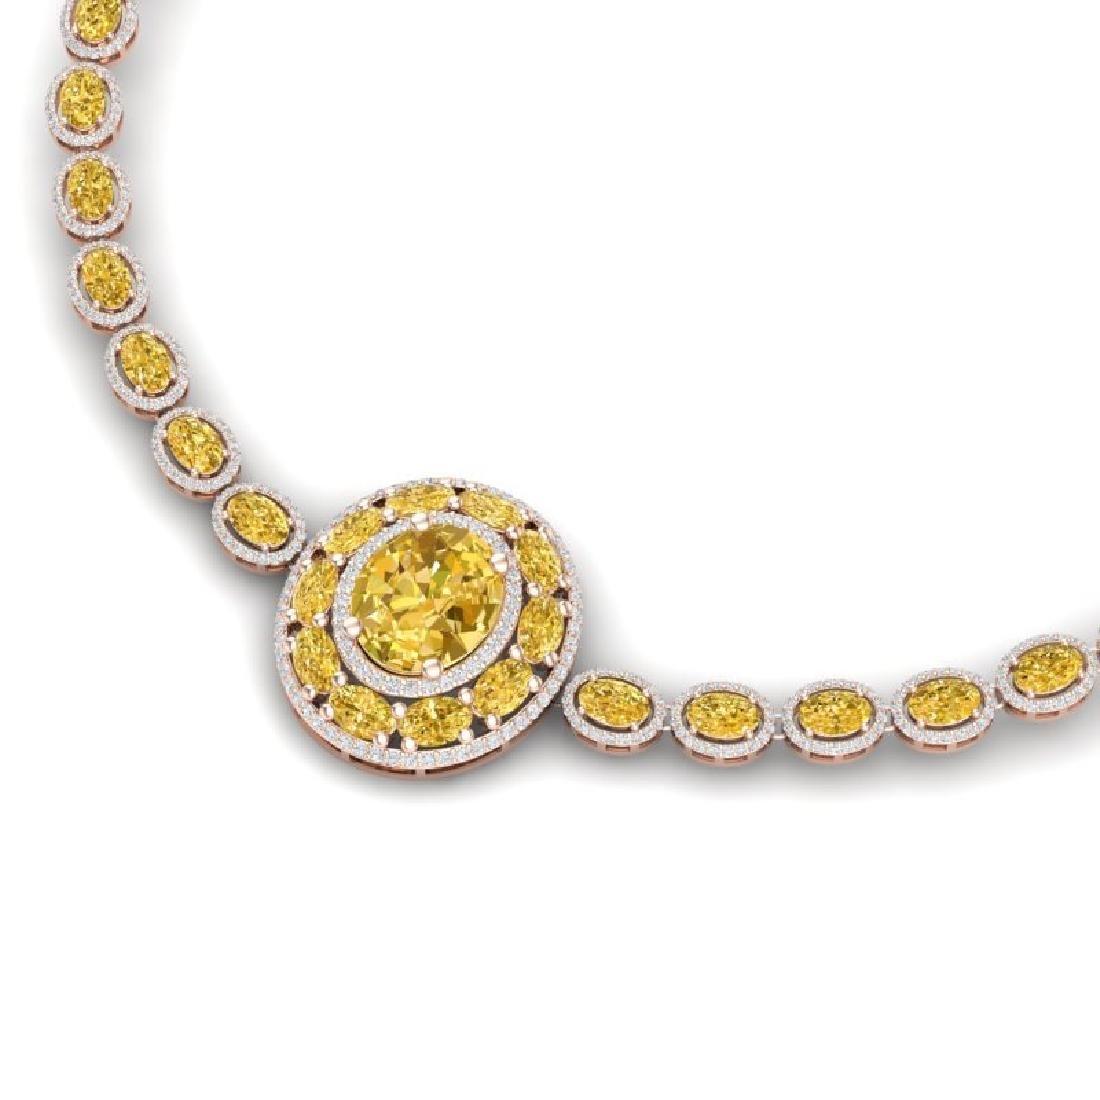 39.04 CTW Royalty Canary Citrine & VS Diamond Necklace